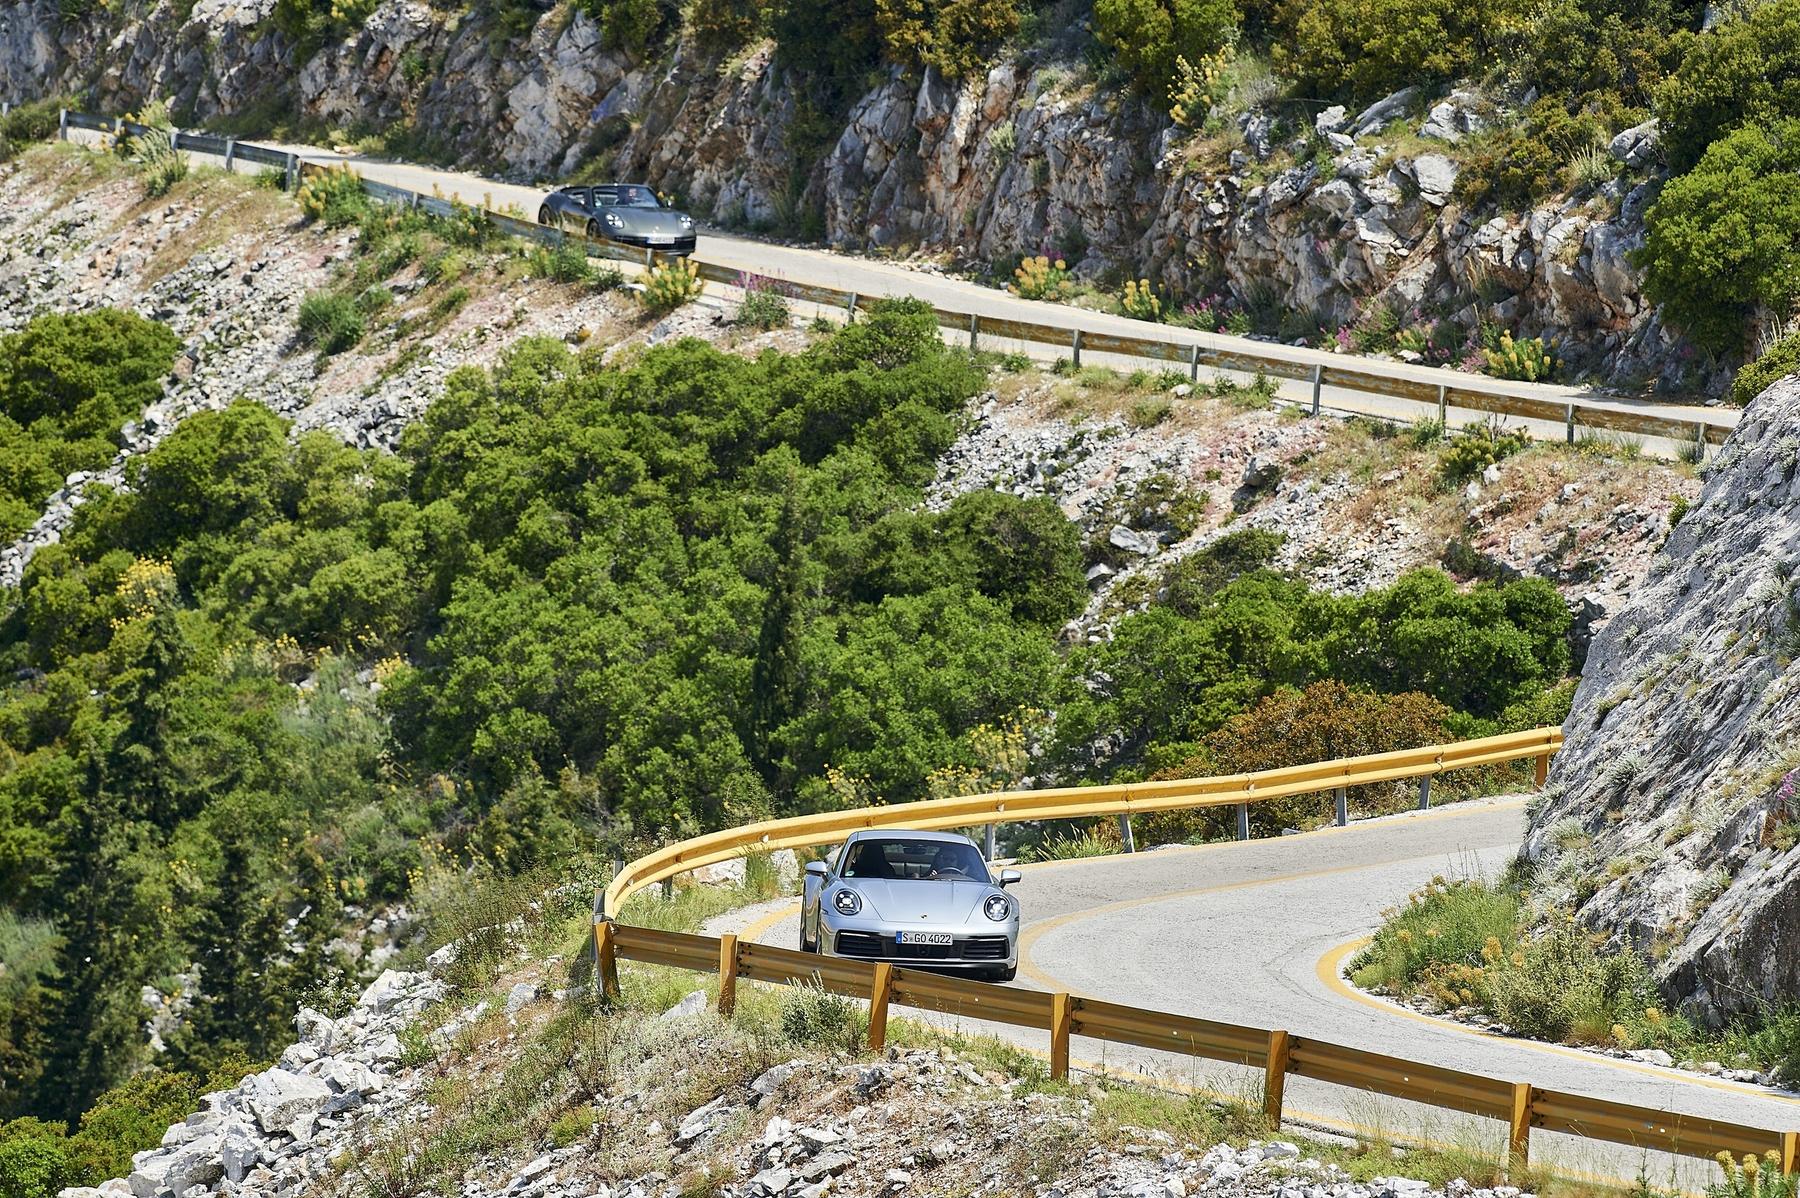 Test_Drive_Porsche_911_Athens_0044